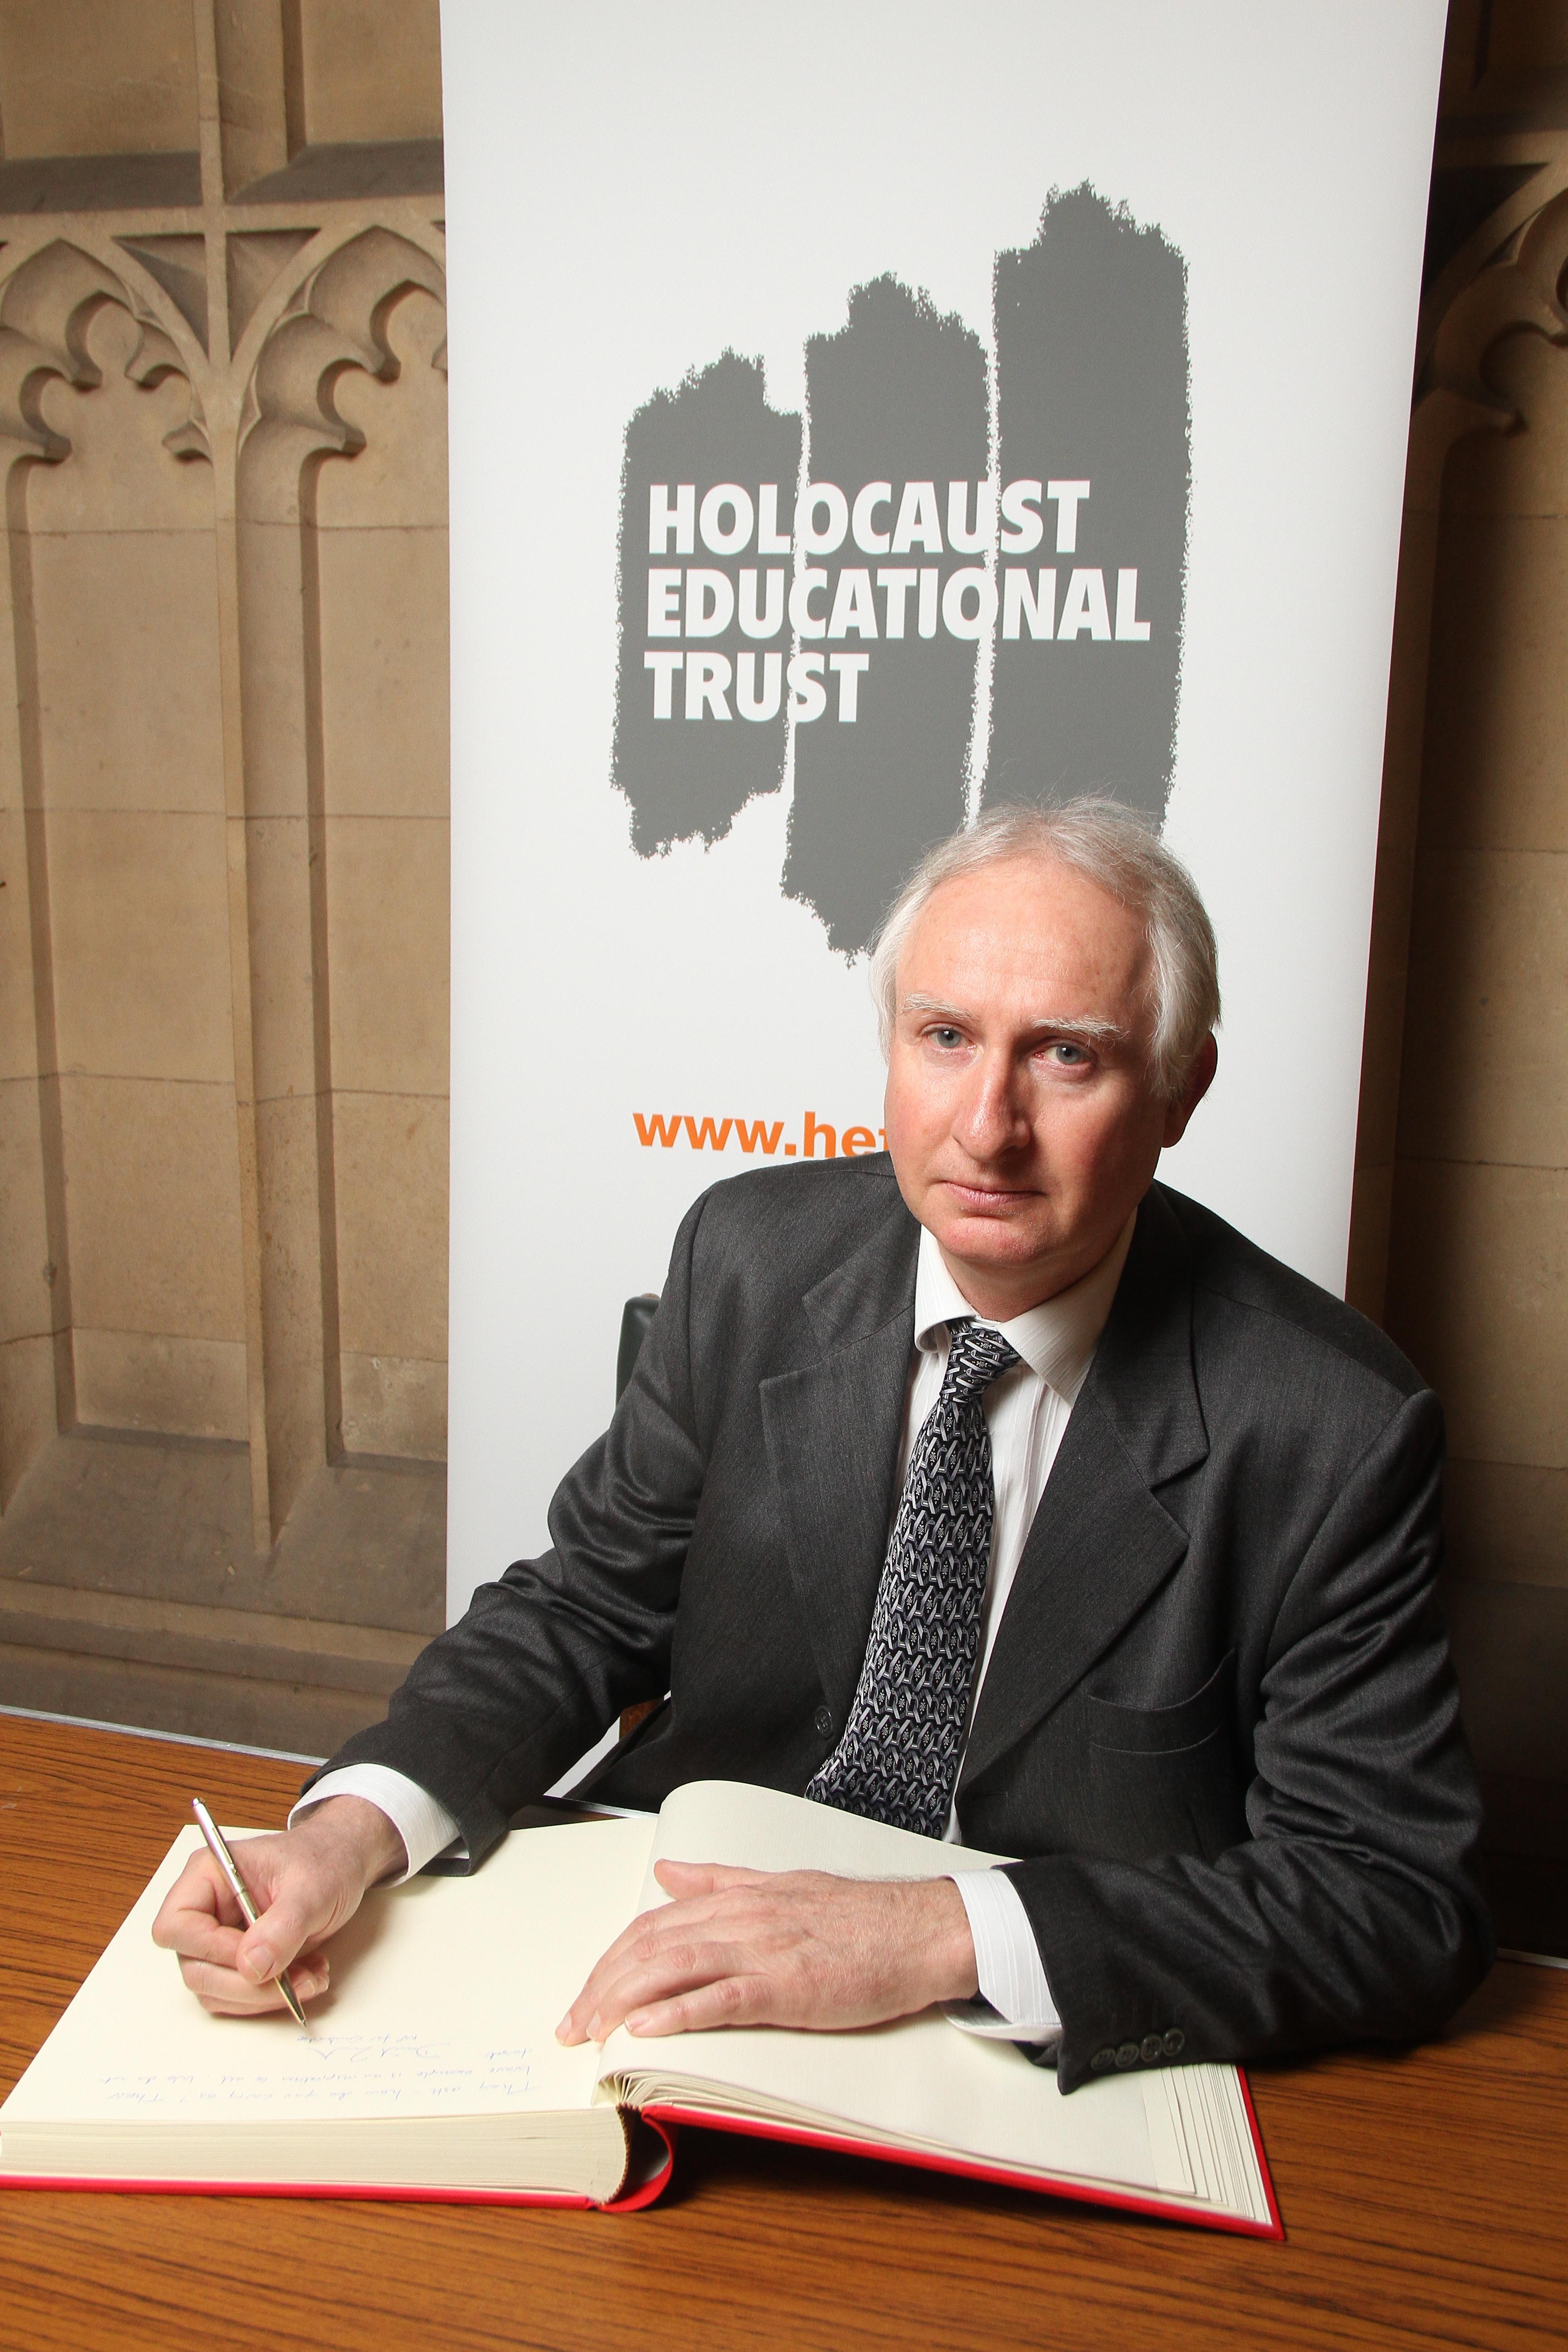 DZ_Holocaust_Trust.jpg